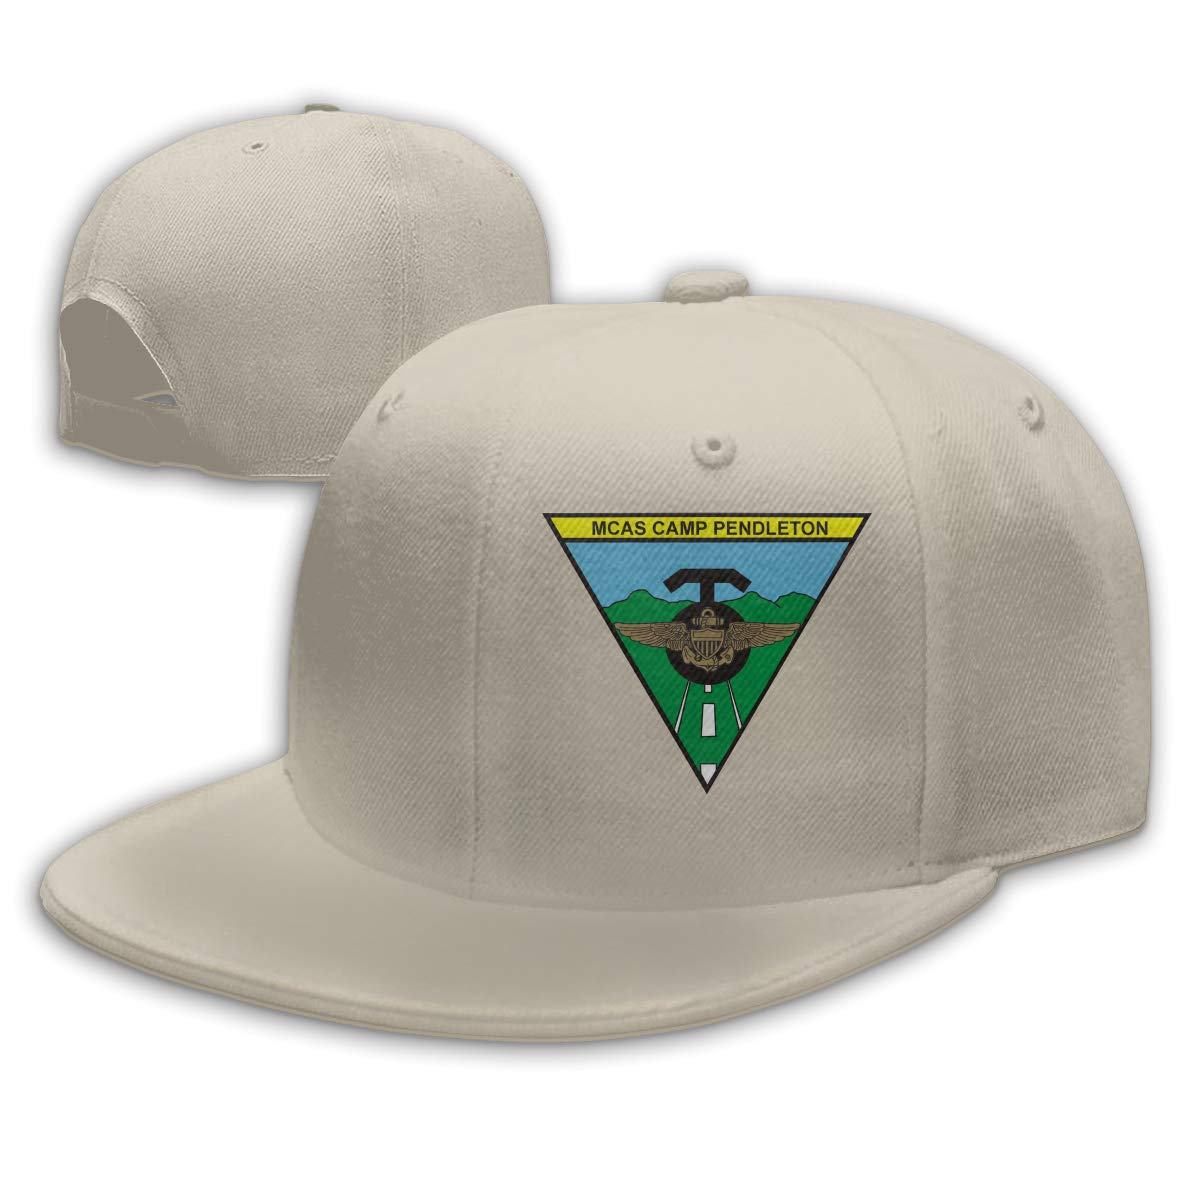 bae6c17775a Marine Corps Air Station Camp Pendleton Logo Adjustable Baseball Cap Flat  Bill Cap Flat Brim Hat at Amazon Men s Clothing store